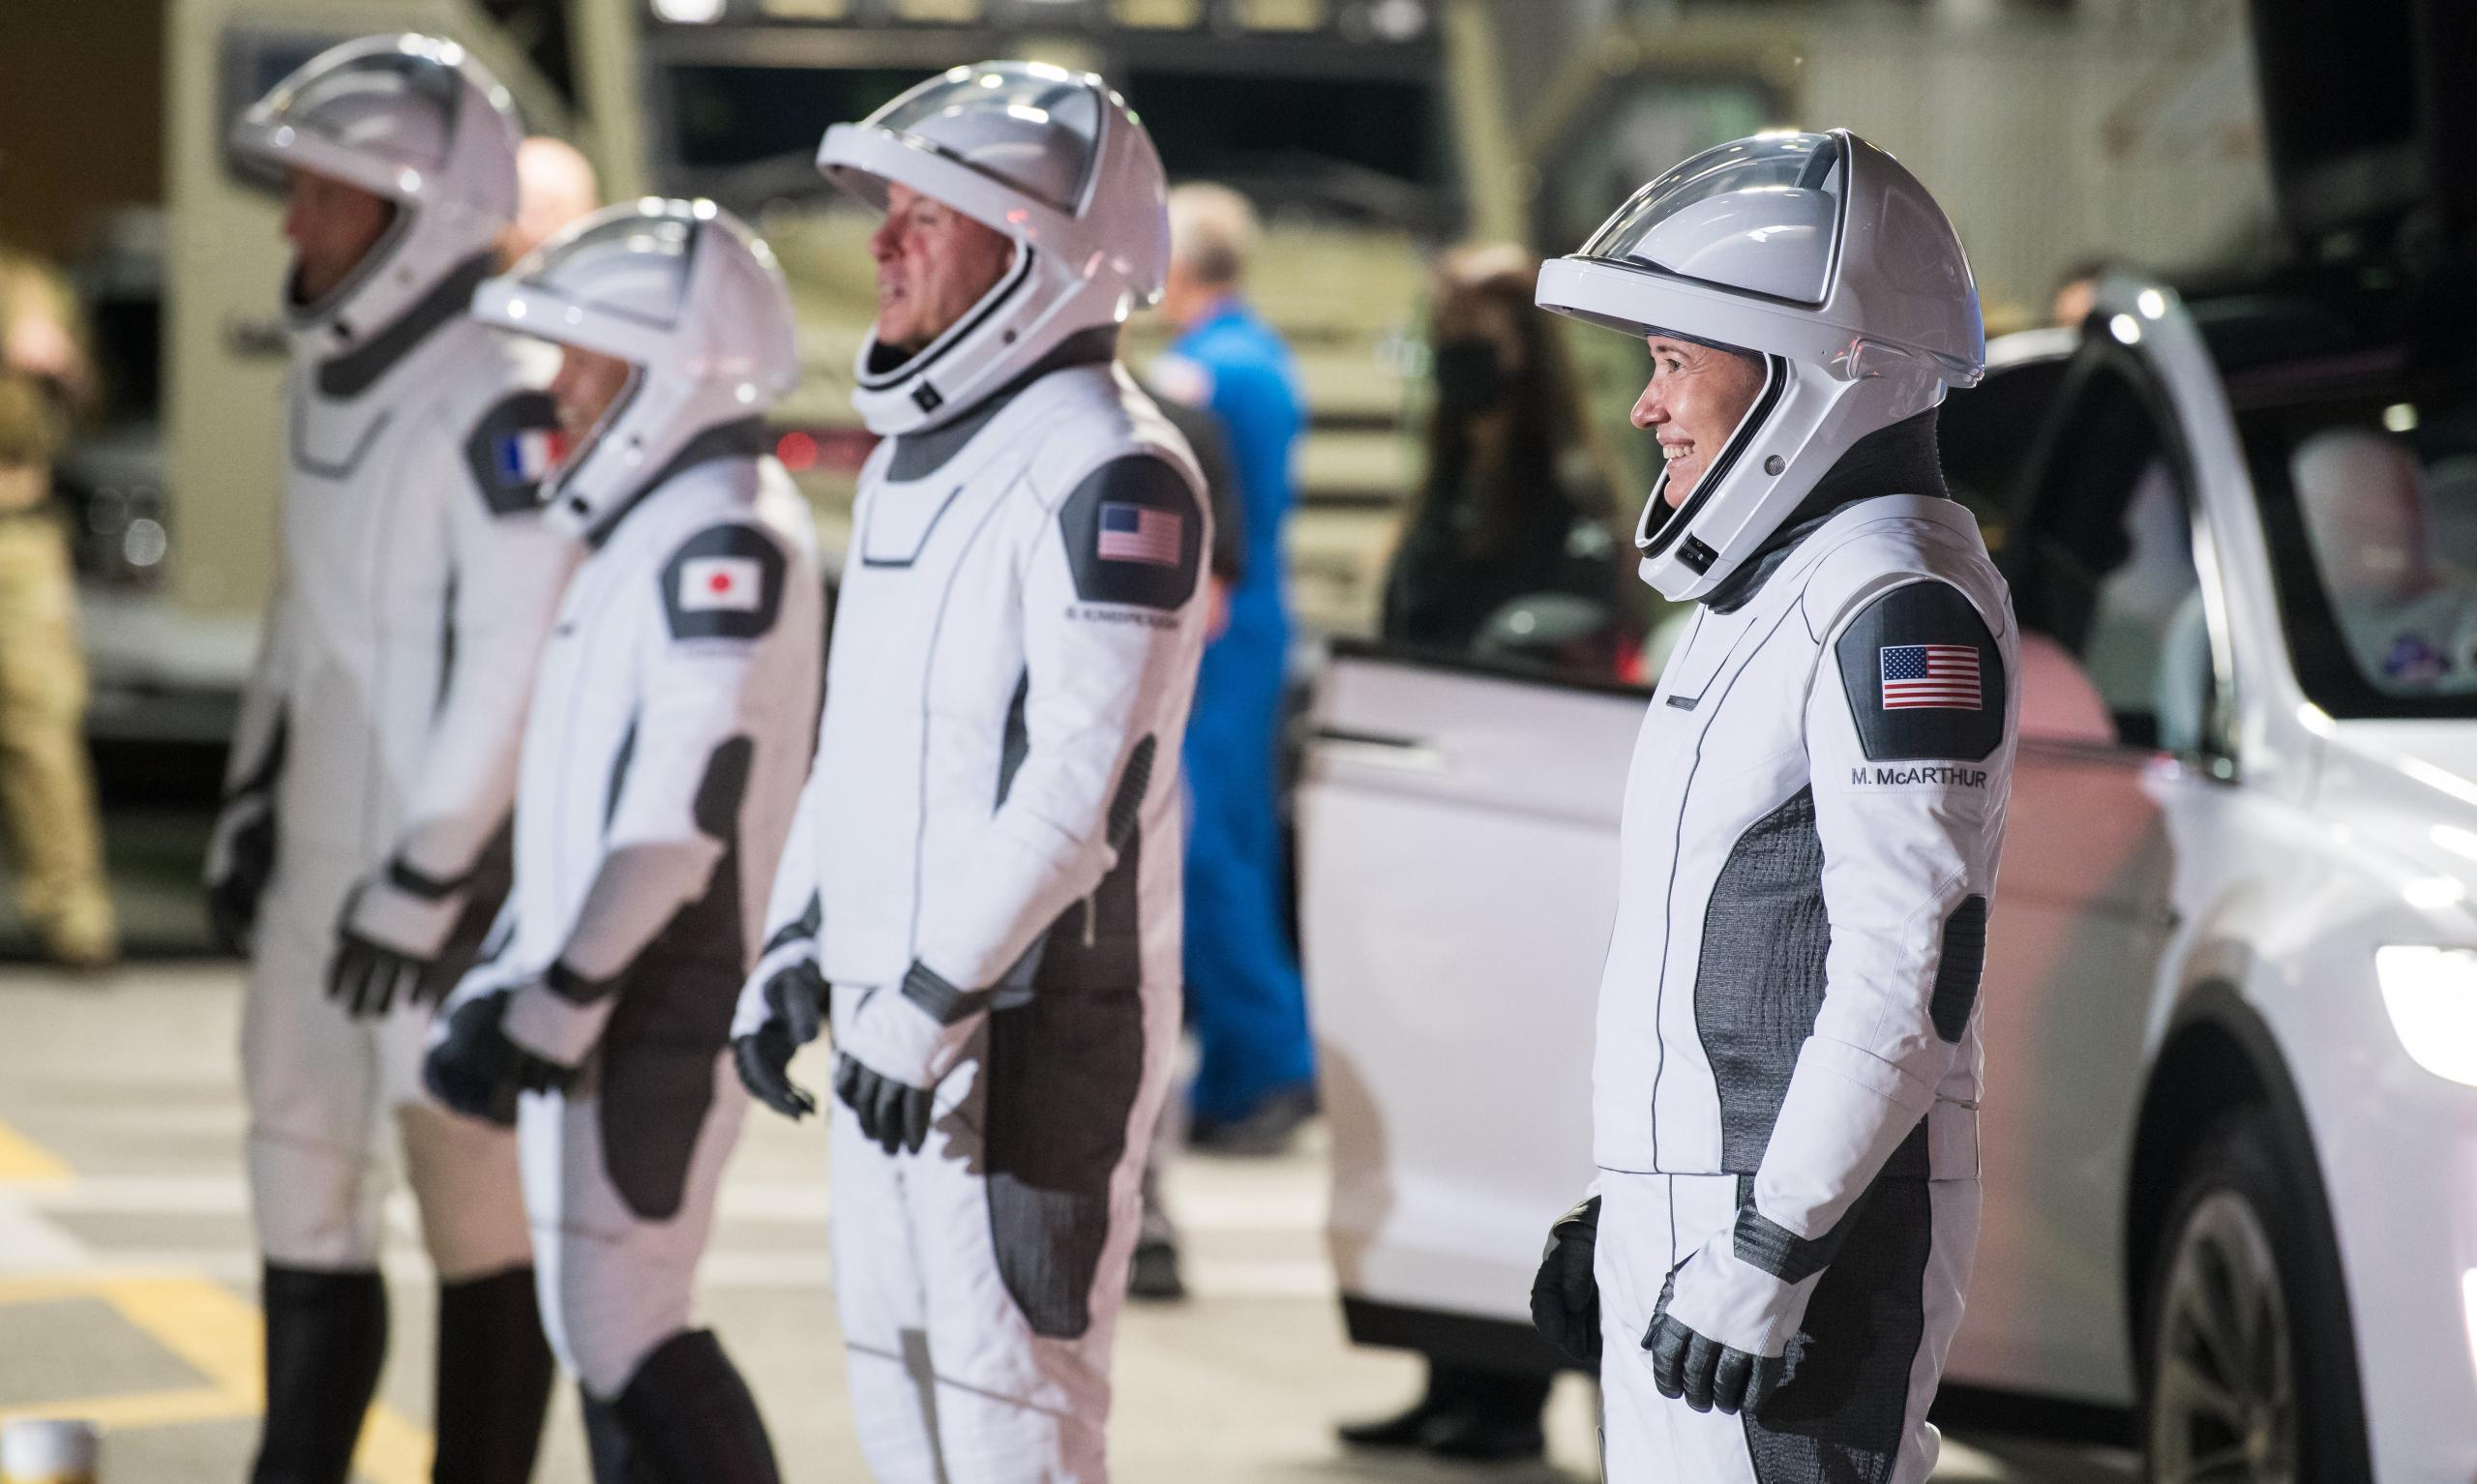 Crew-2 Crew Dragon C206 Falcon 9 B1061 39A 041821 (NASA) dry dress 1 crop (c)